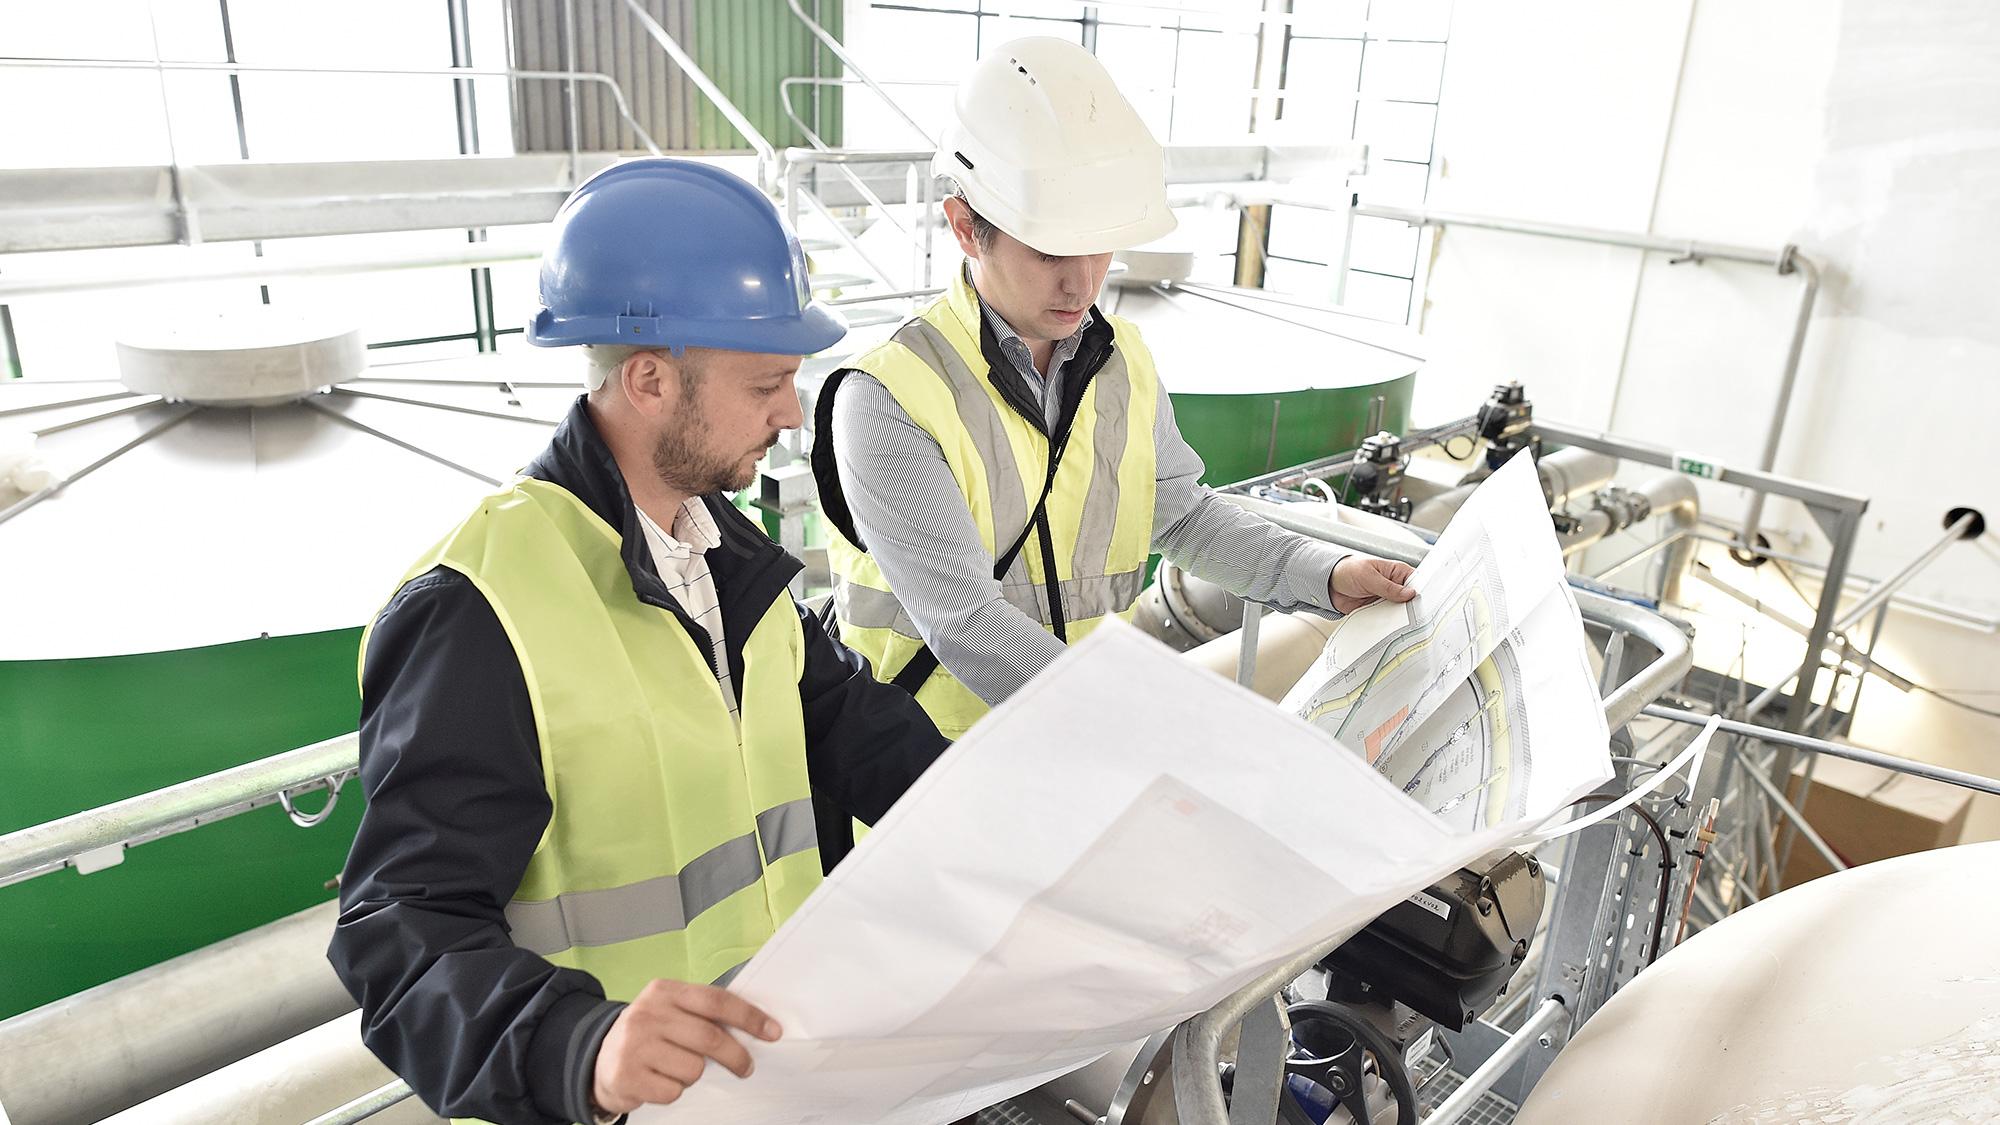 Engineers look over plans